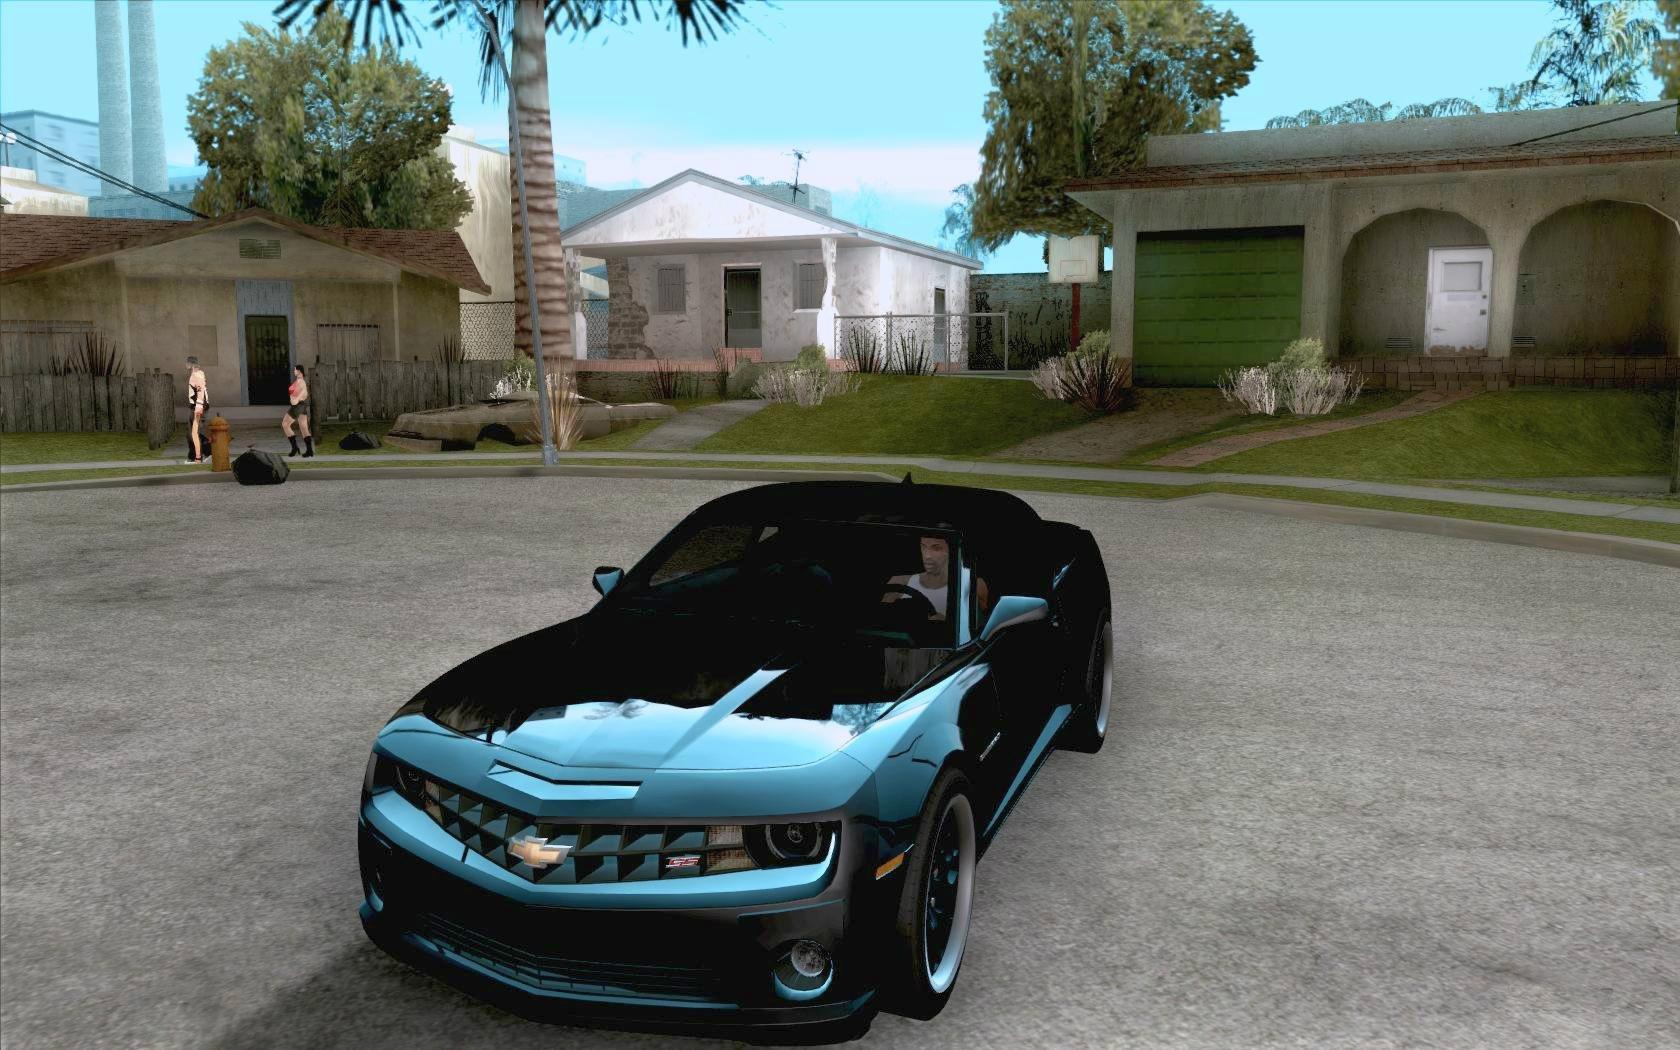 gta_sa2013-01-3016-17-49-88.jpg - Grand Theft Auto: San Andreas